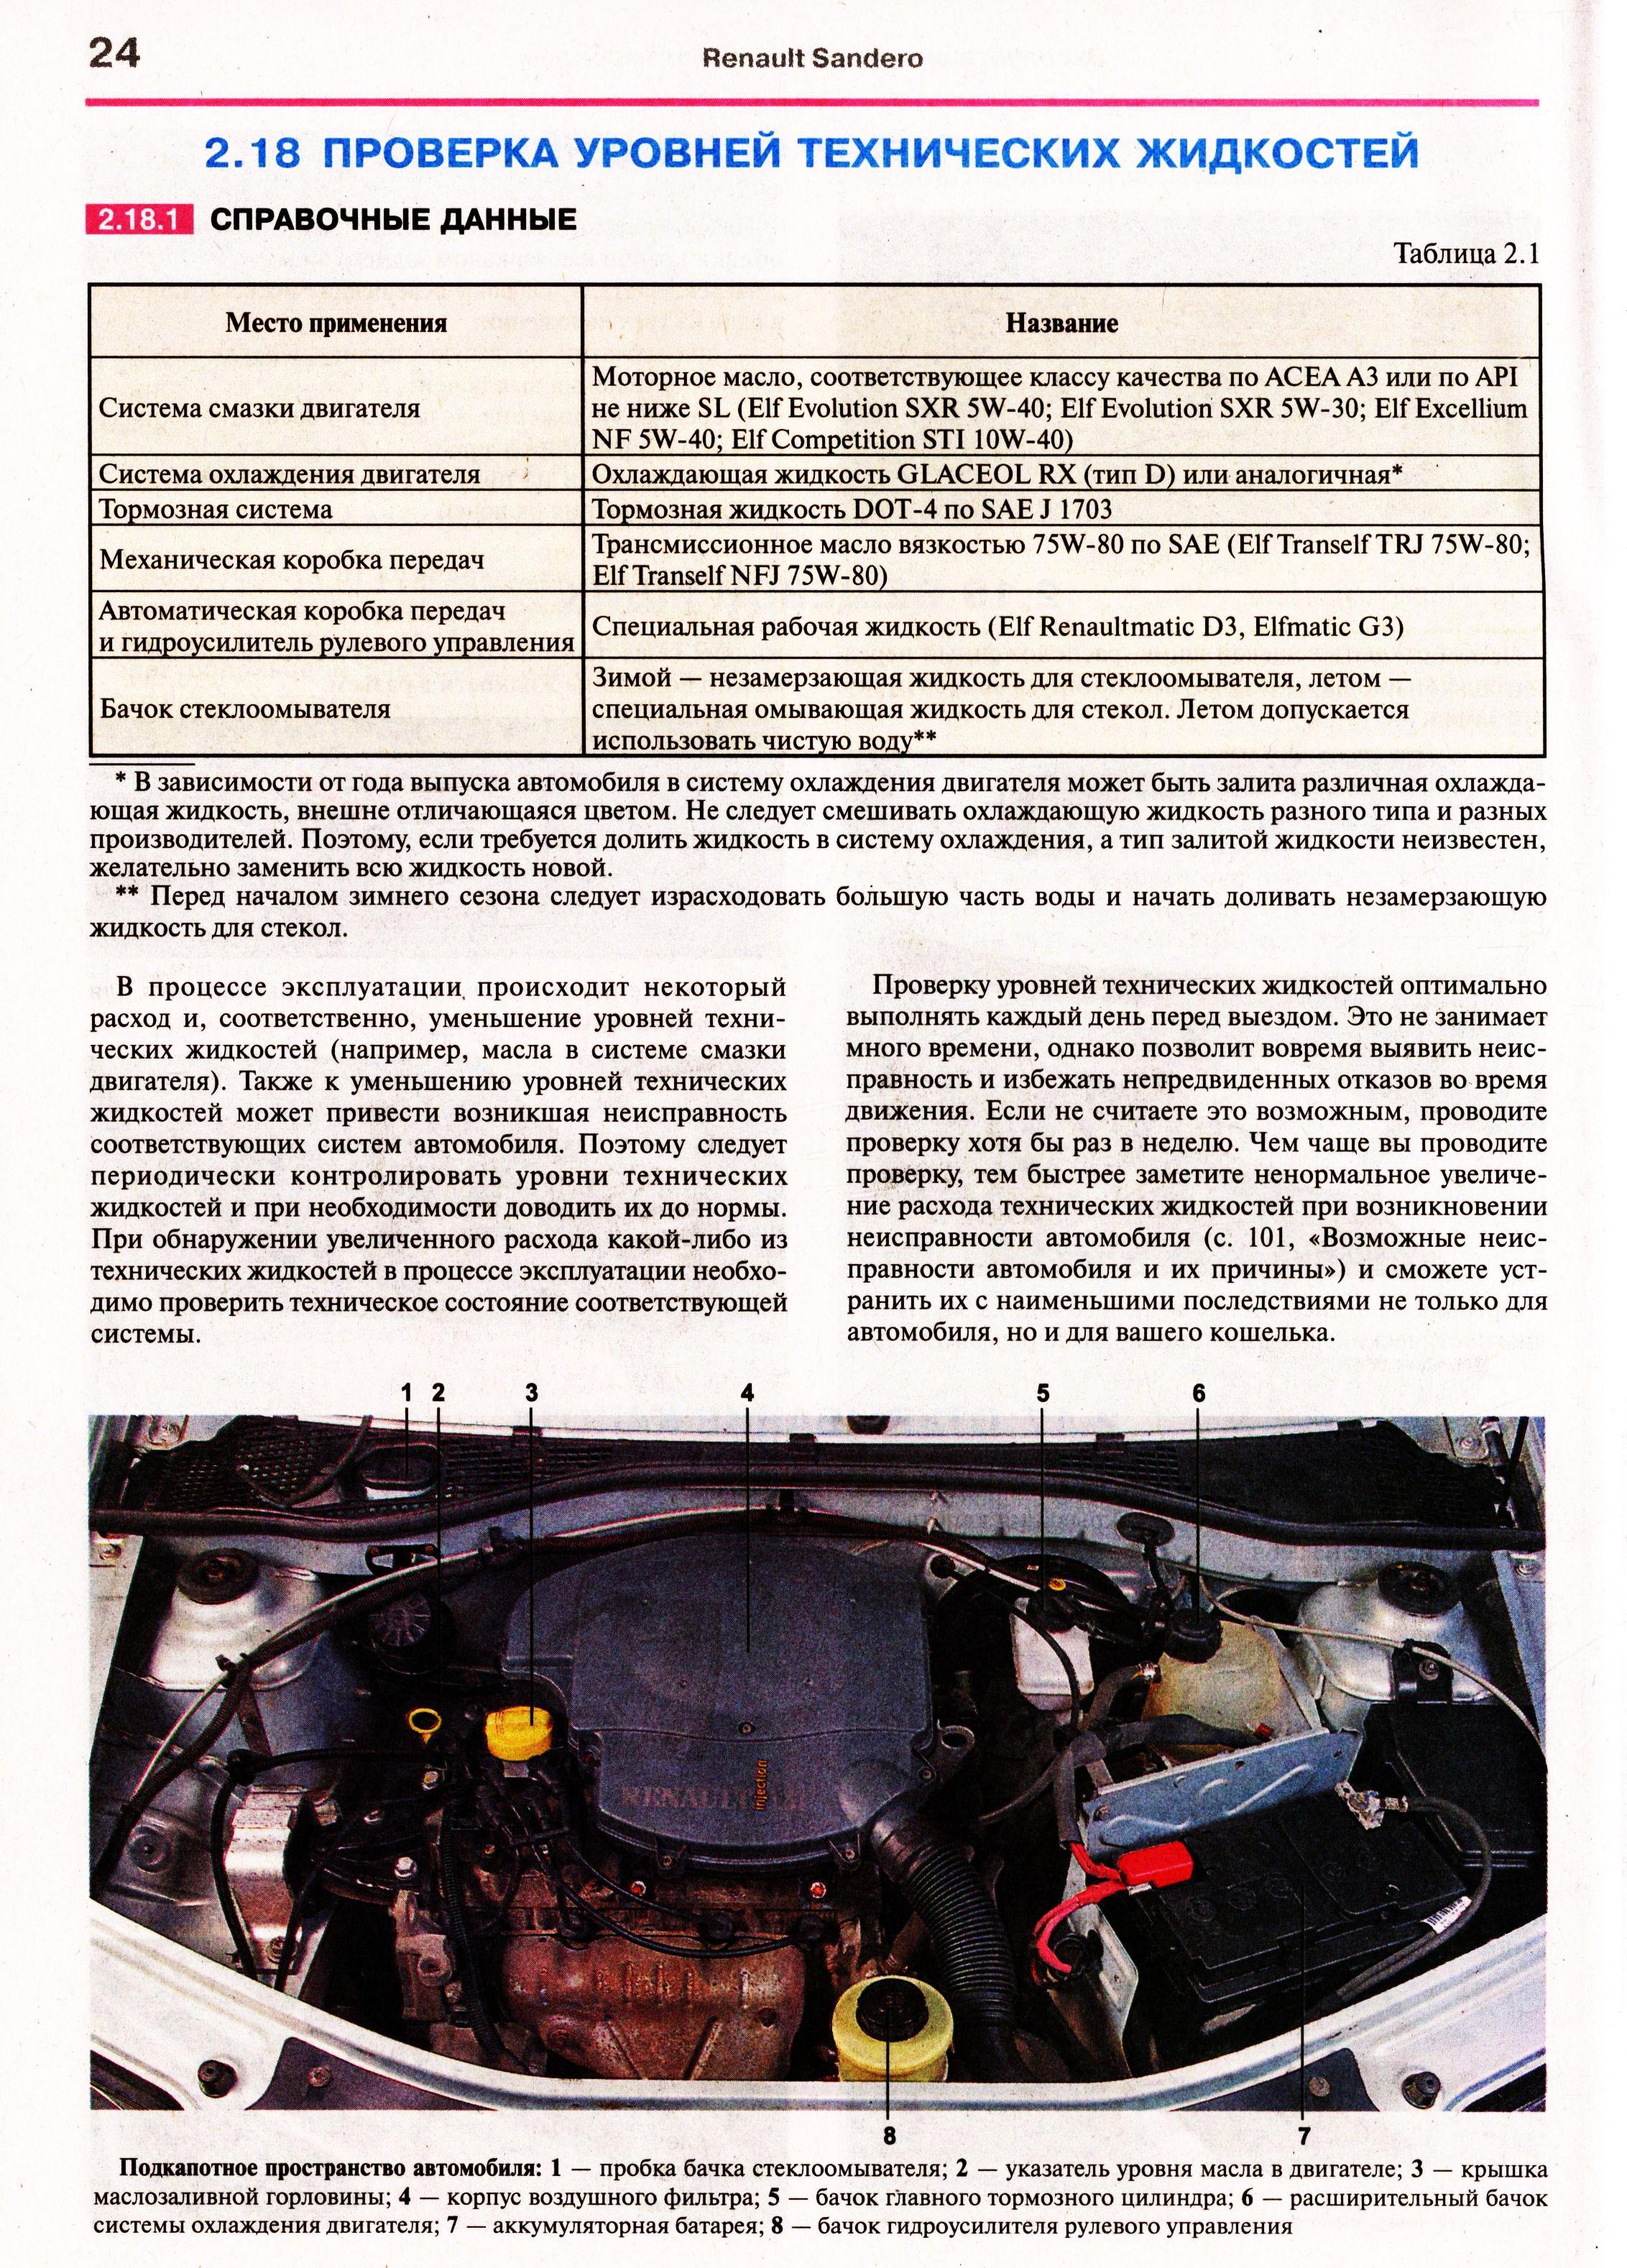 инструкция по эксплуатации рено сандеро степвей 2011